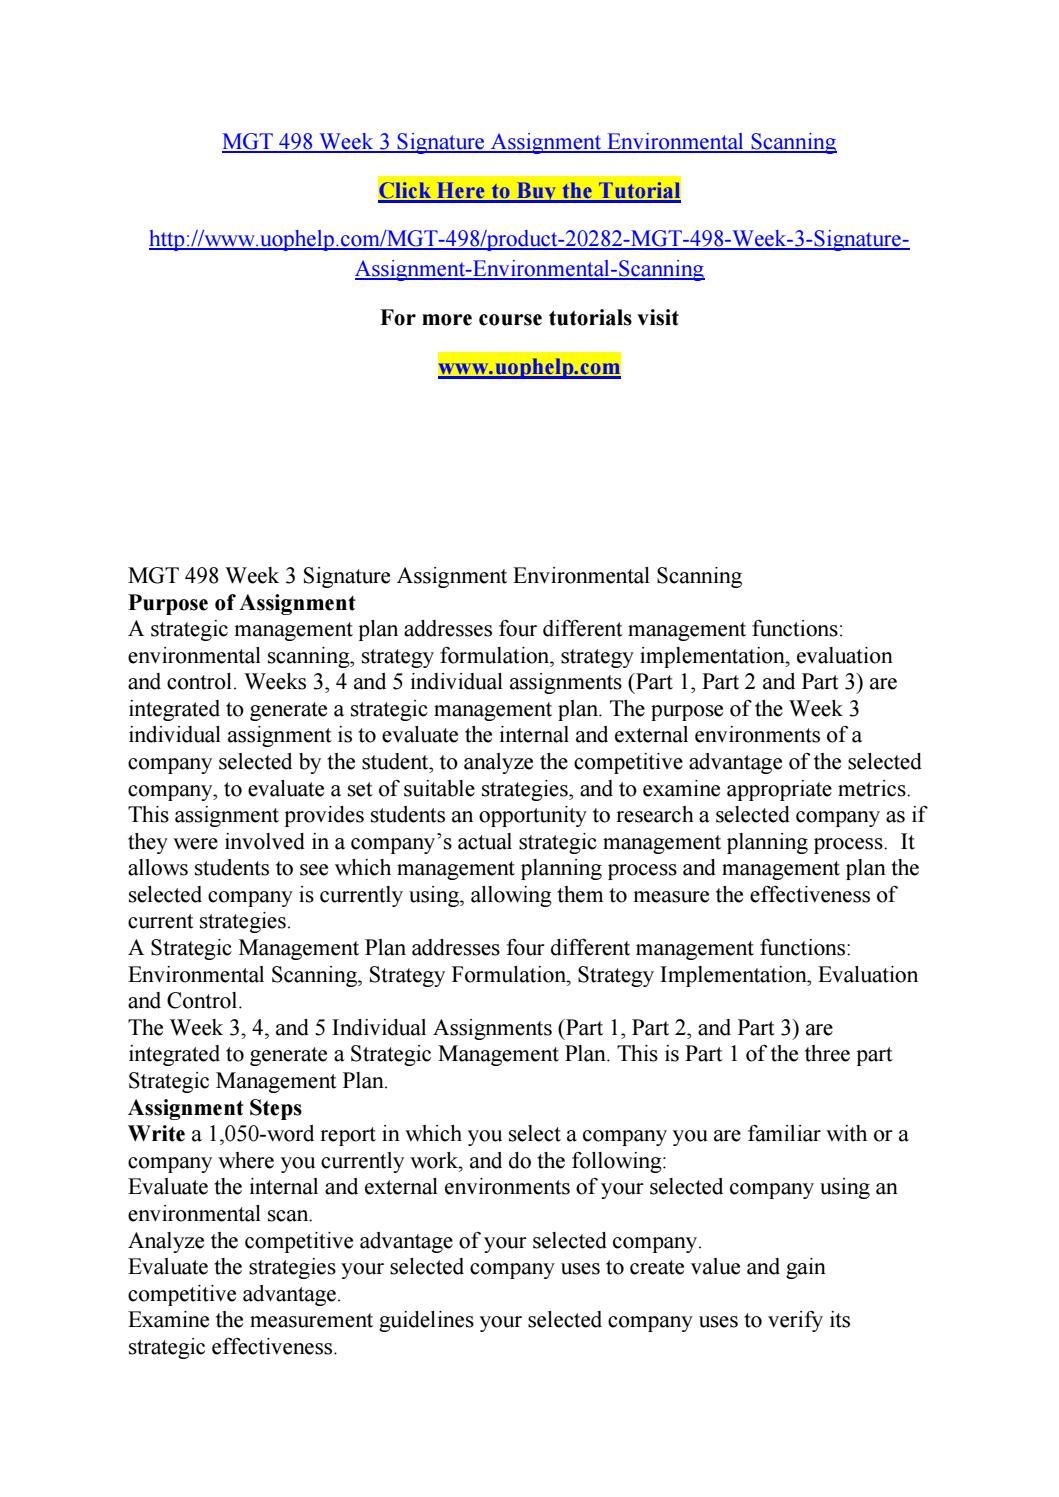 mgt 498 week three individual environmental scan Read mgt 498 week 3 learning team weekly reflection from the story mgt 498 week 3 individual environmental scan paper mgt 498 week 3 learning team weekly reflection.